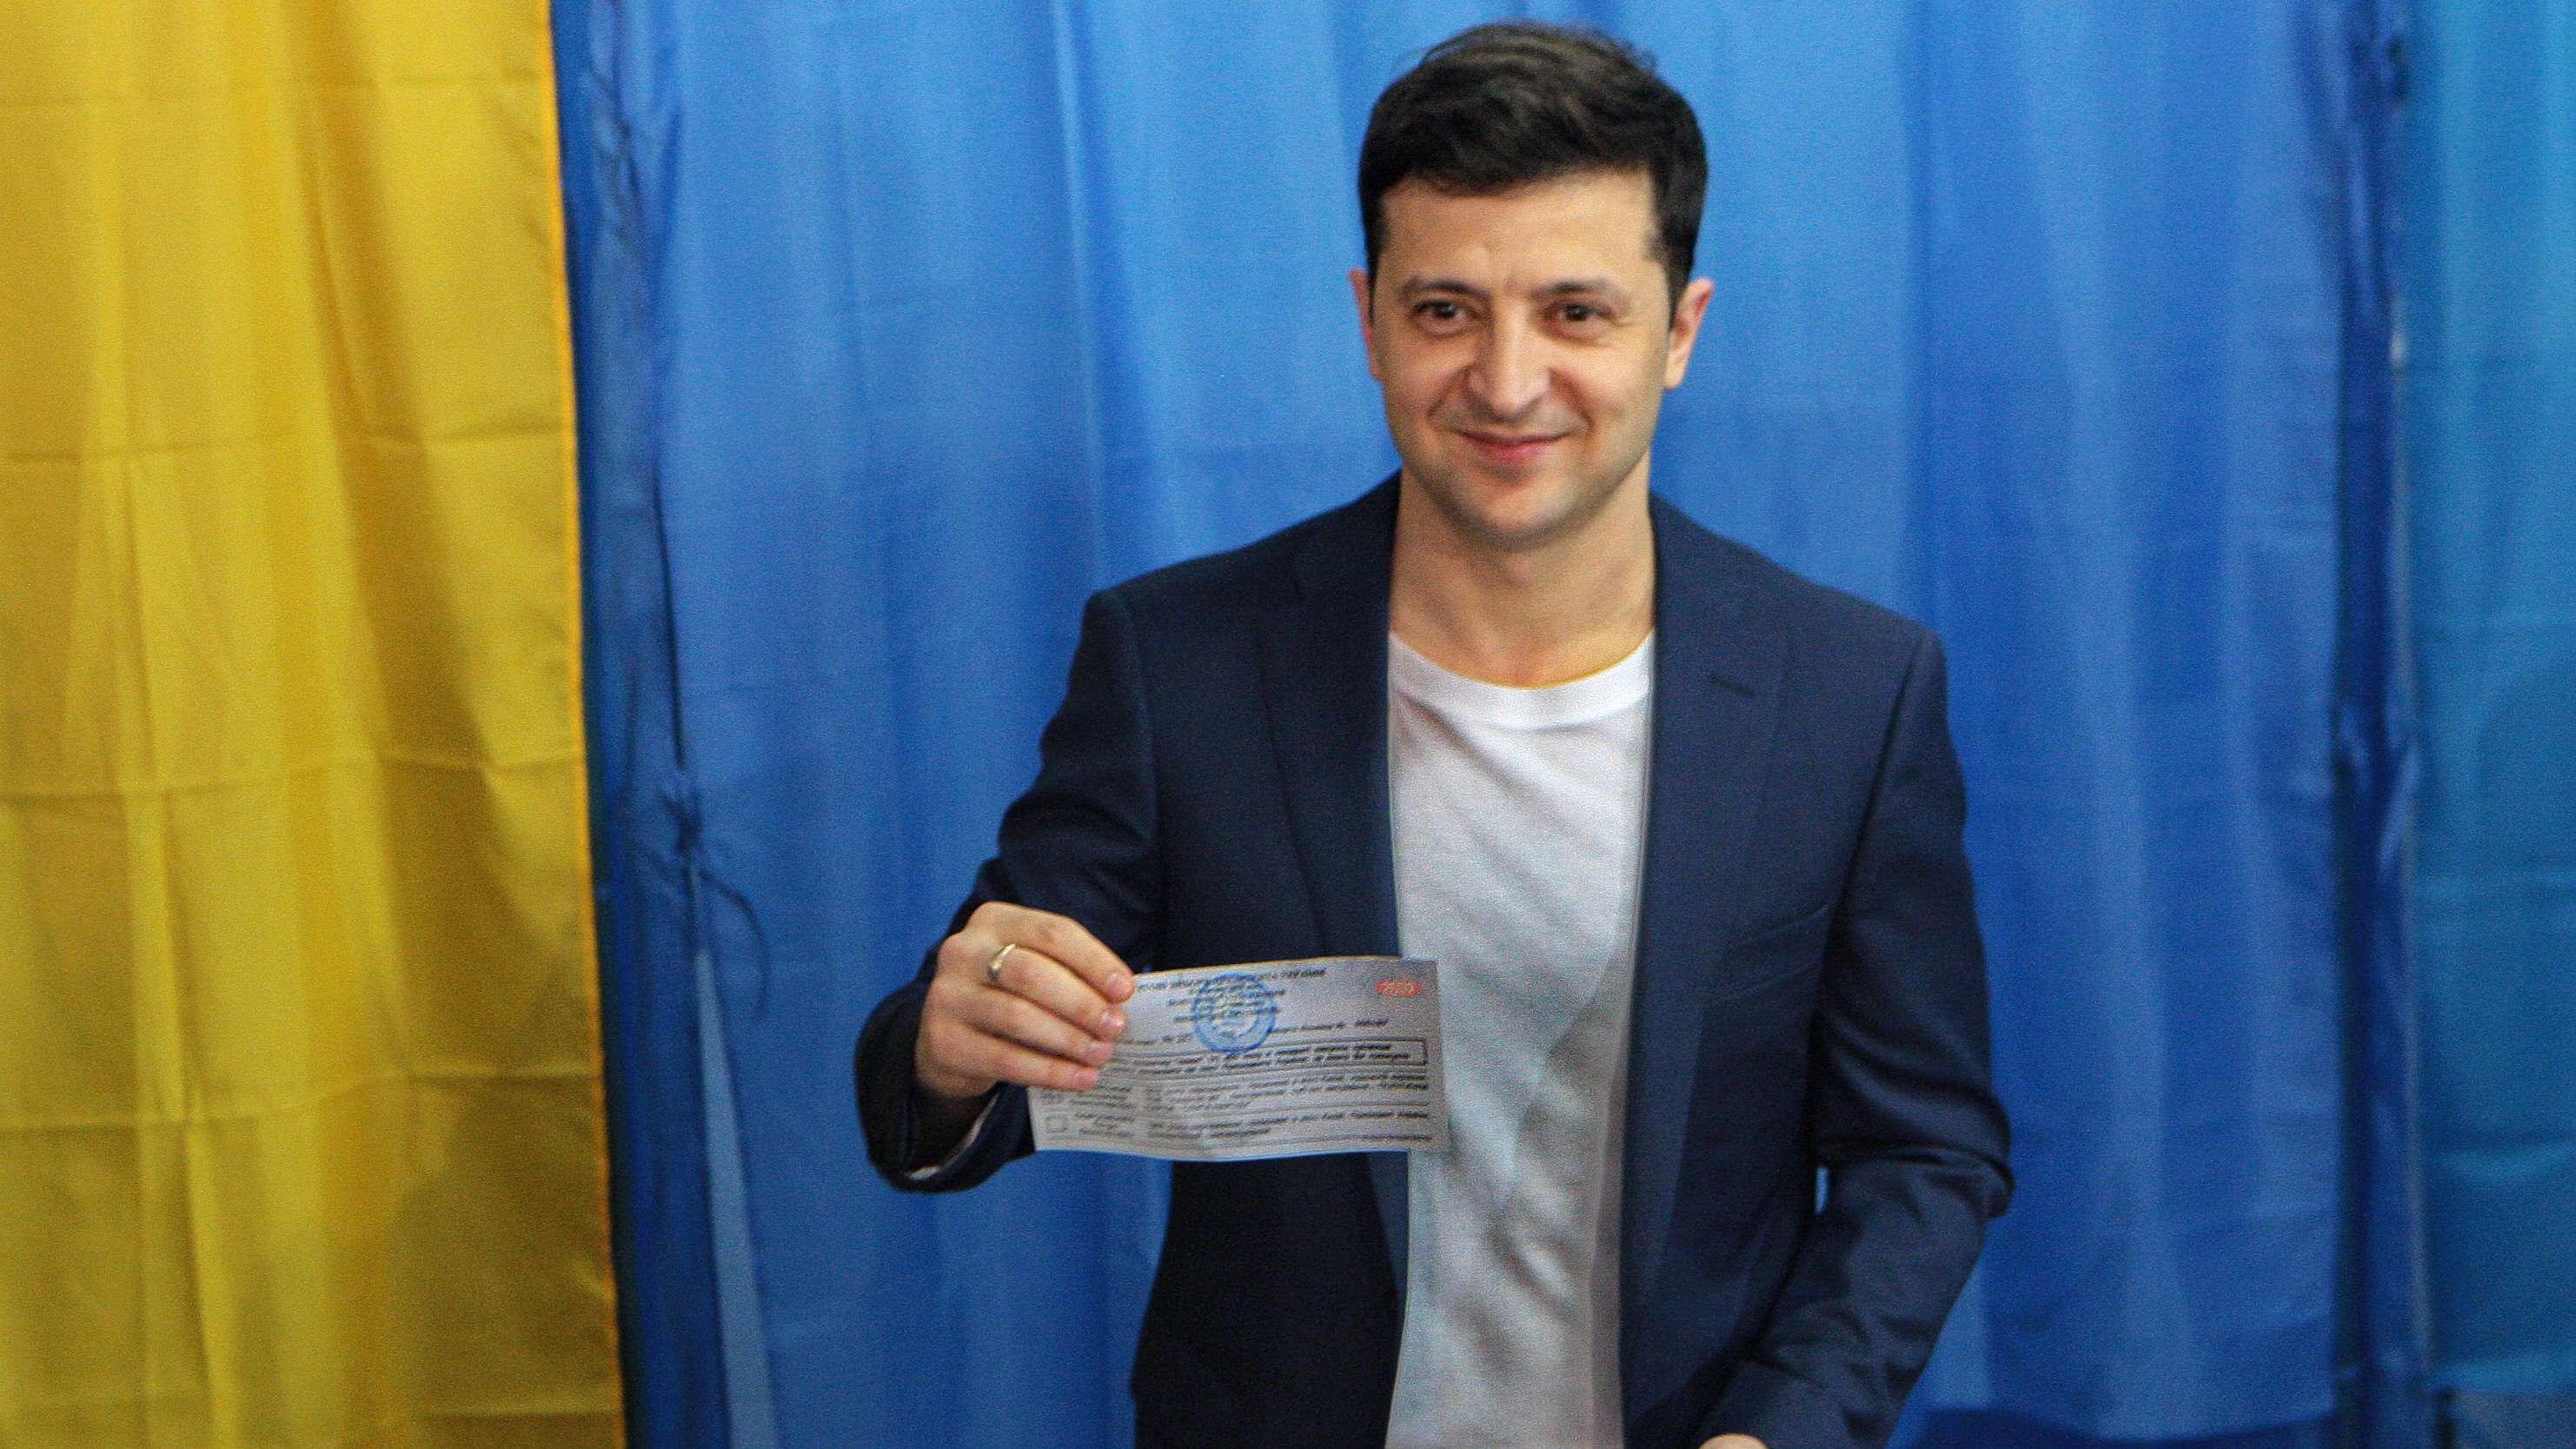 Wolodymyr Selenskyj bei der Stimmabgabe.